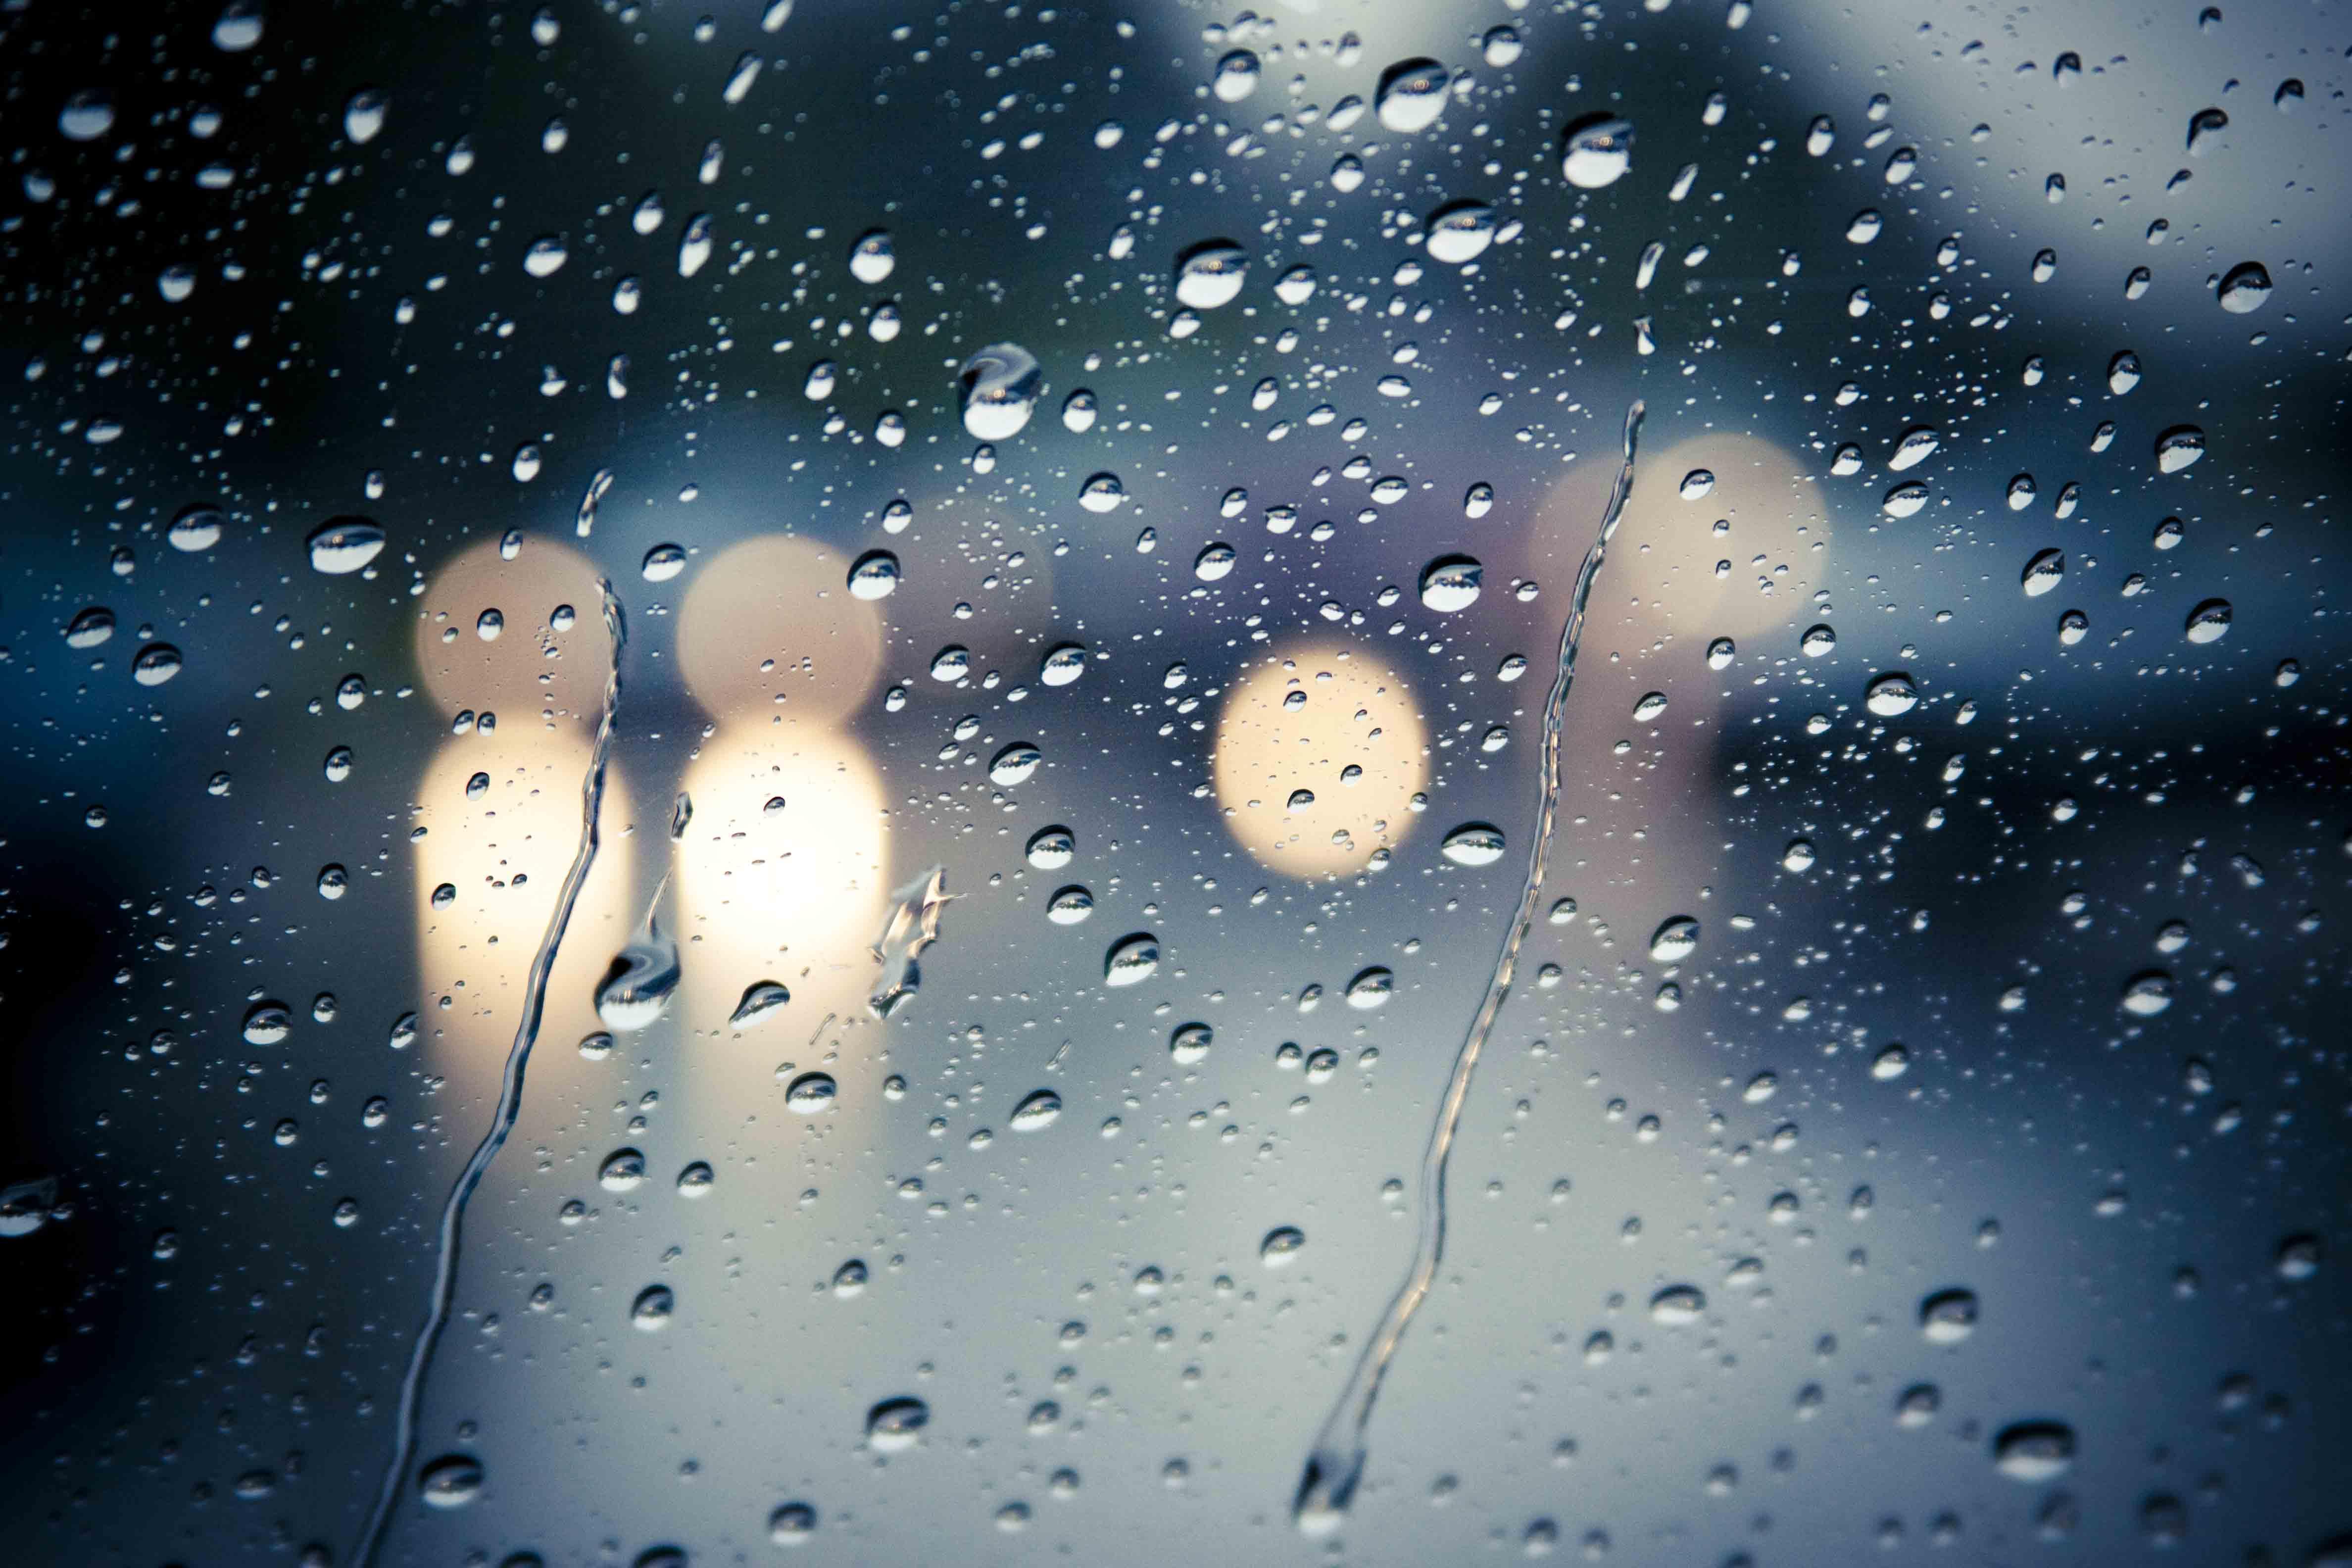 Hujan Deras Mati Lampu Kepergianmu Dan Kegelapanku